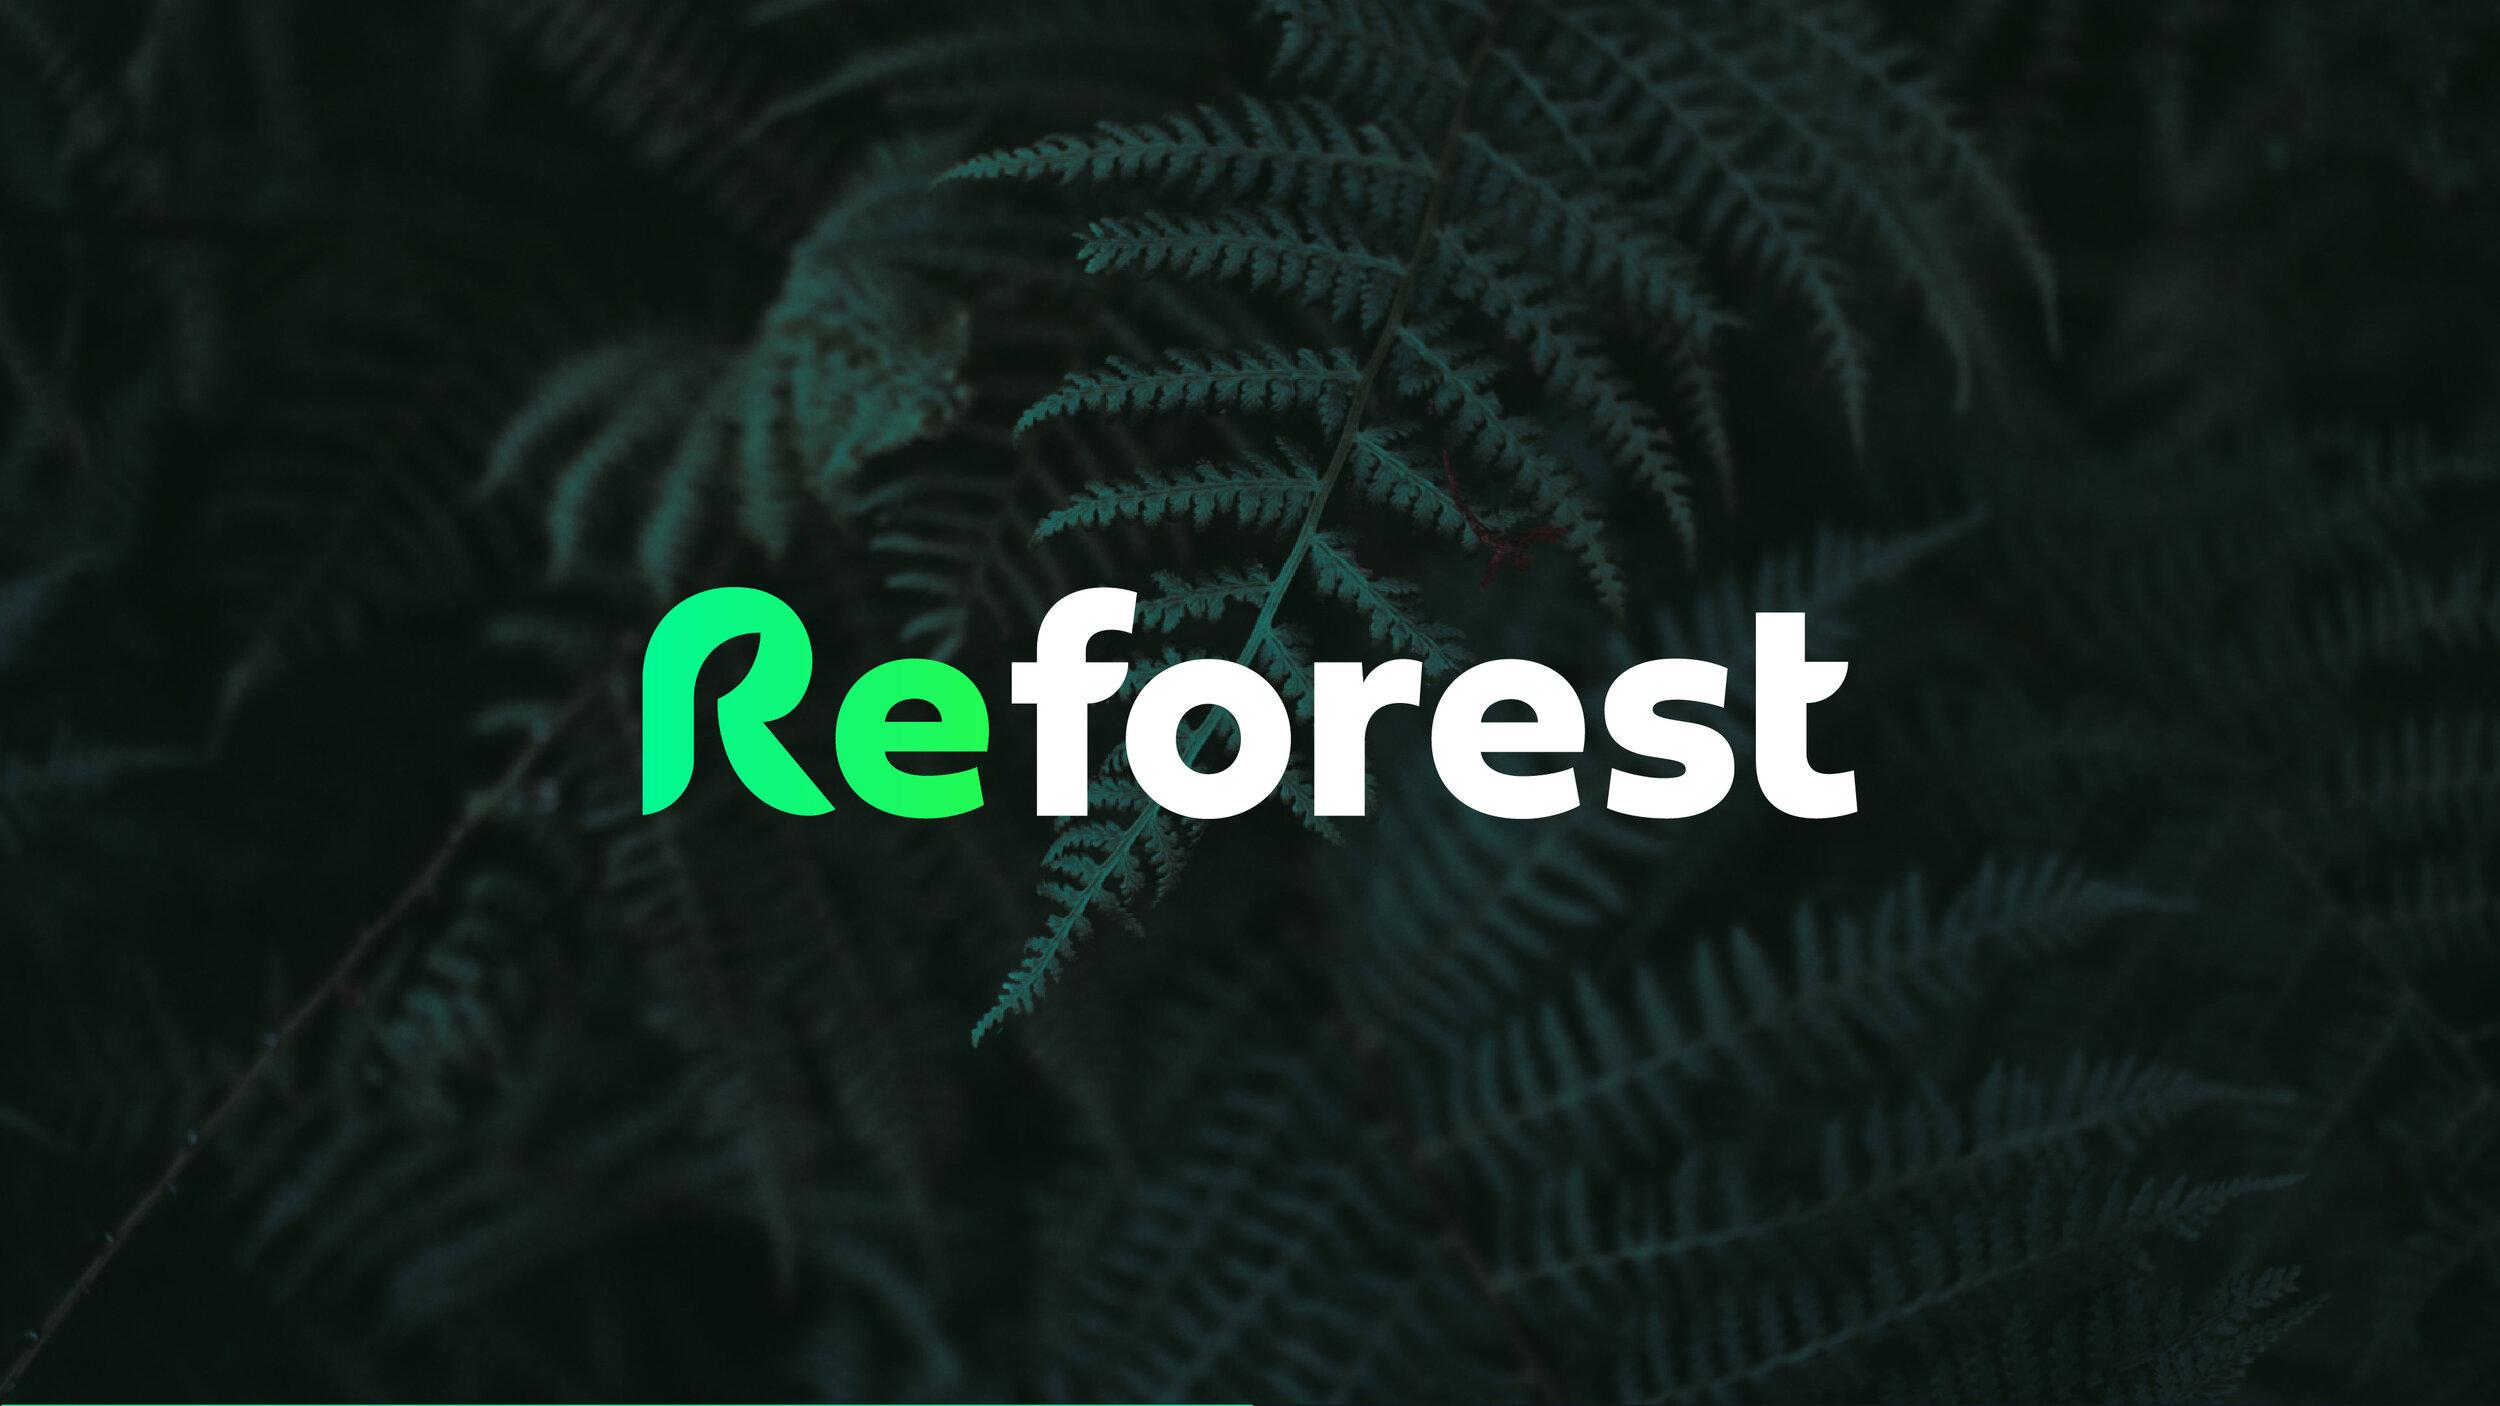 Reforest App Design 01